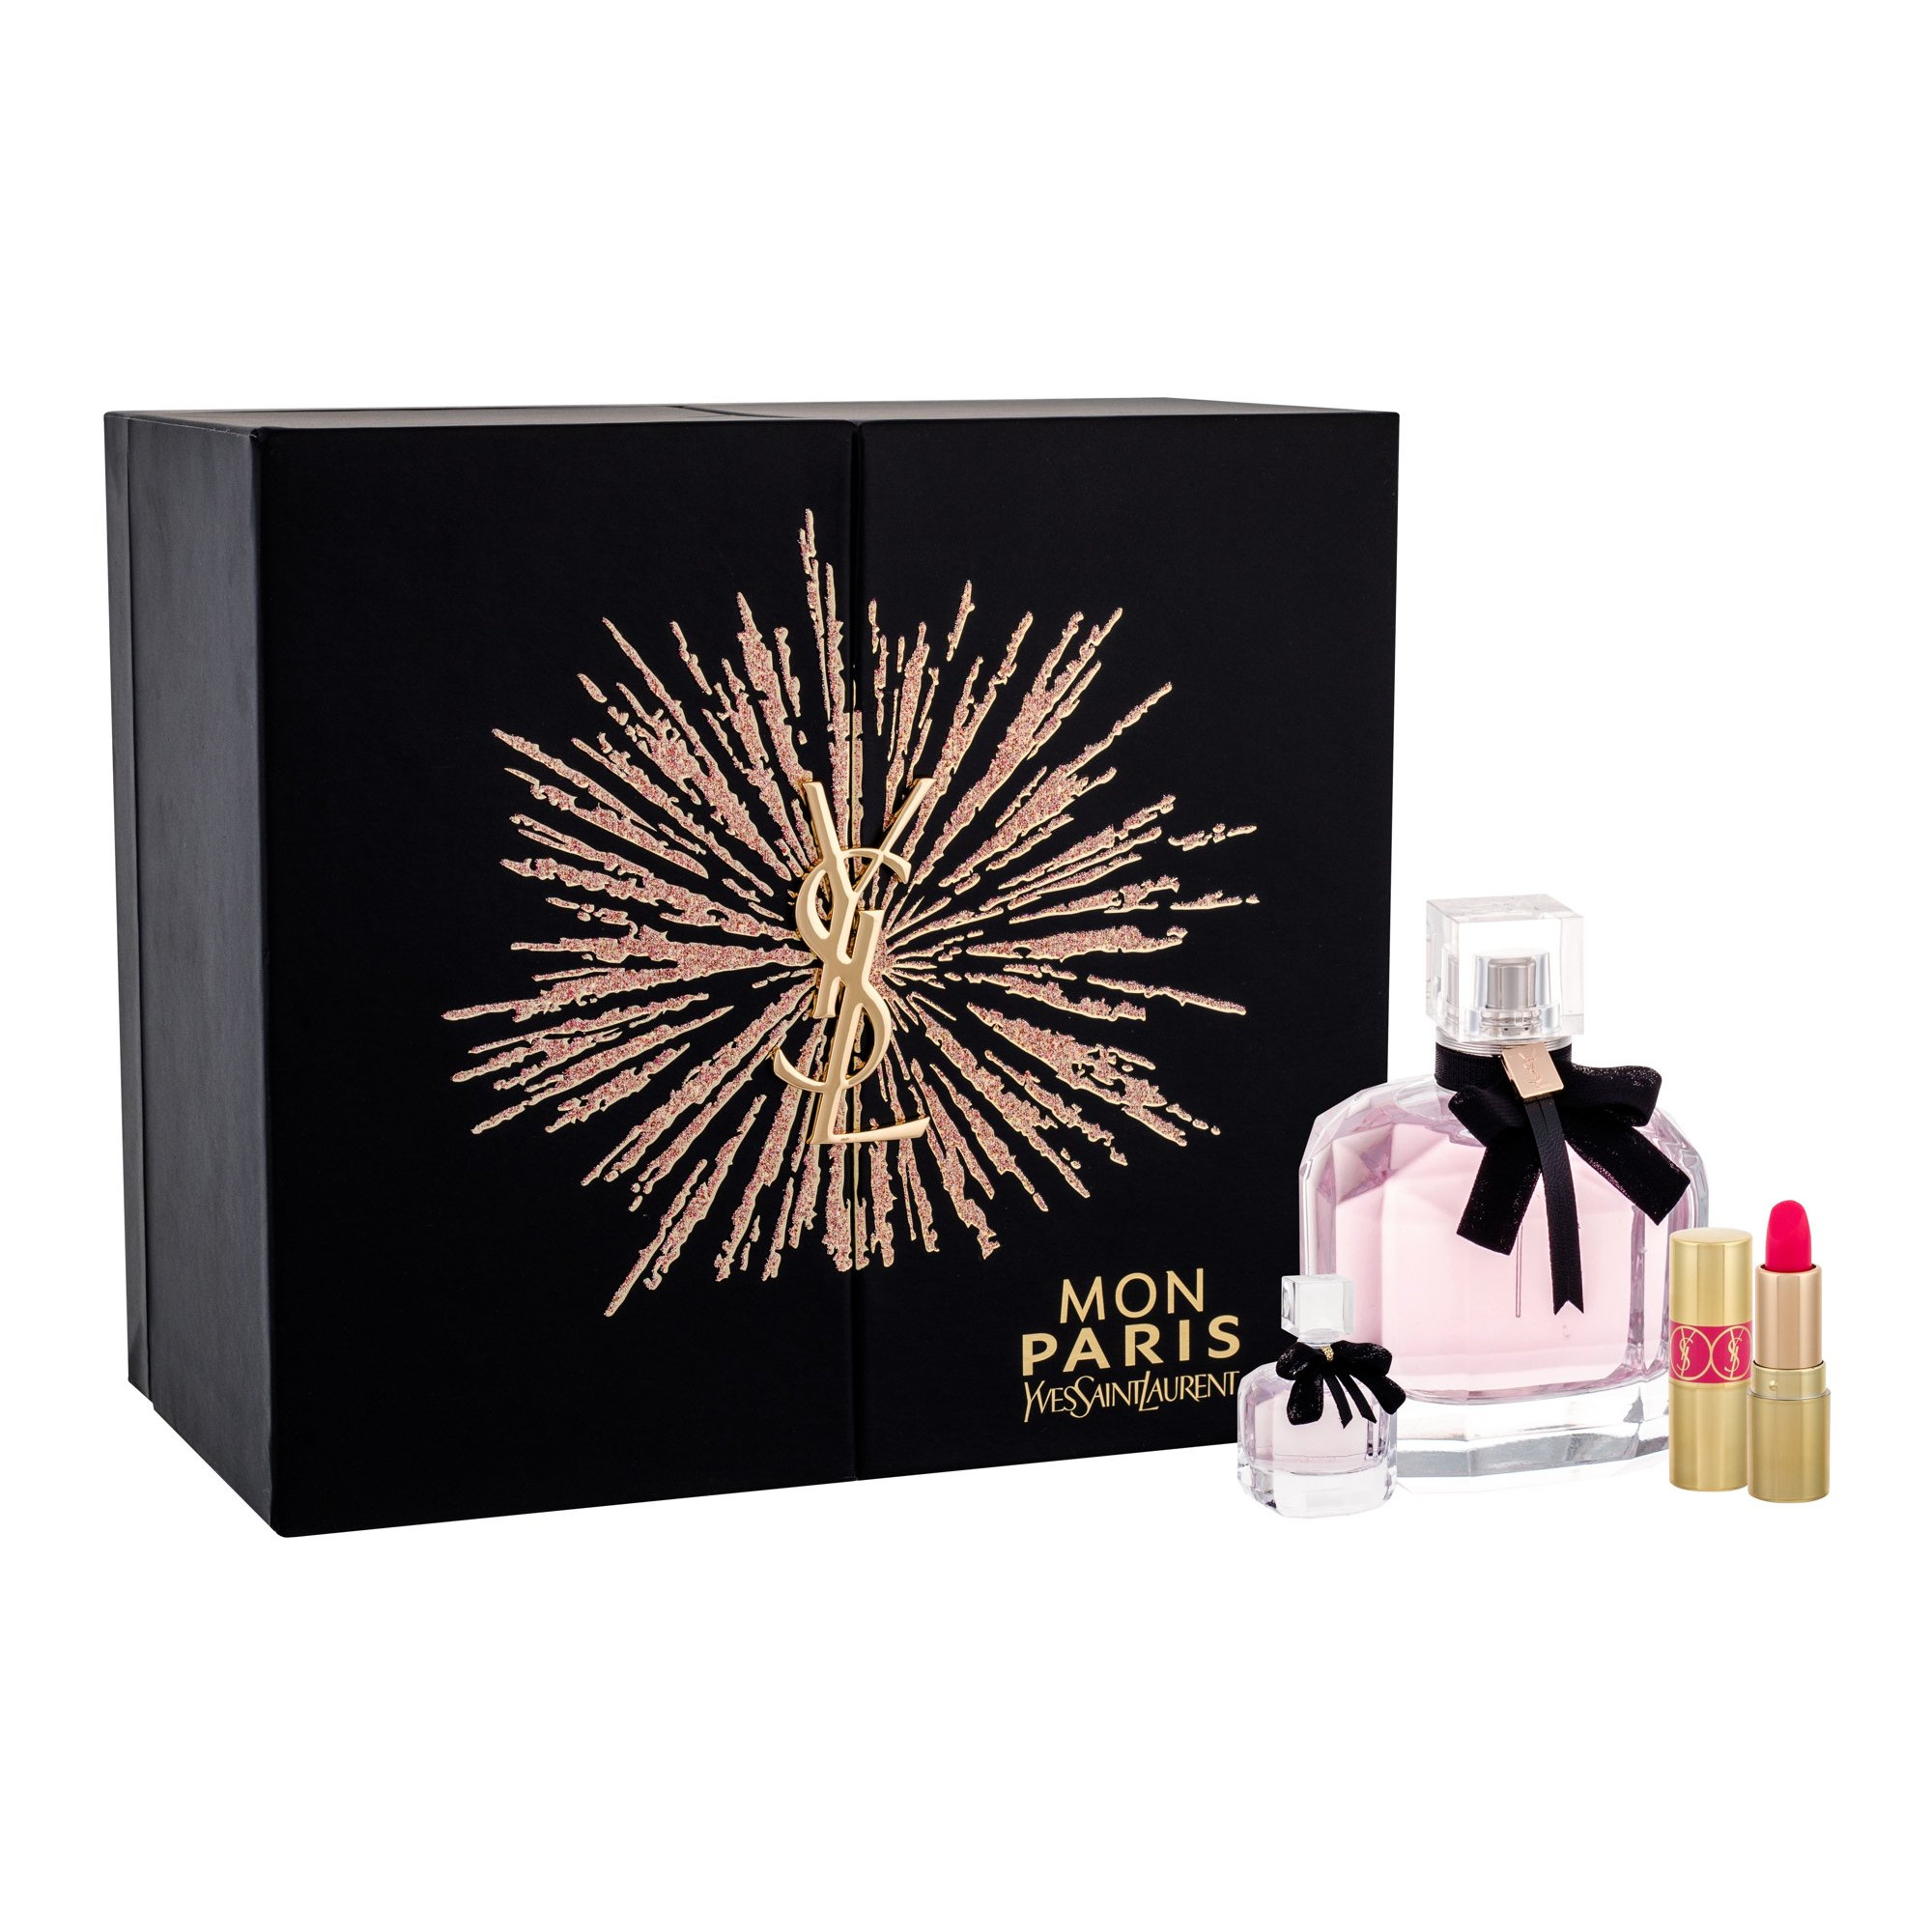 Yves Saint Laurent Mon Paris - parfémová voda 90 ml + parfémová voda 7,5 ml + rtěnka Rouge Volupte Shine N. 49 W Objem: 90 ml